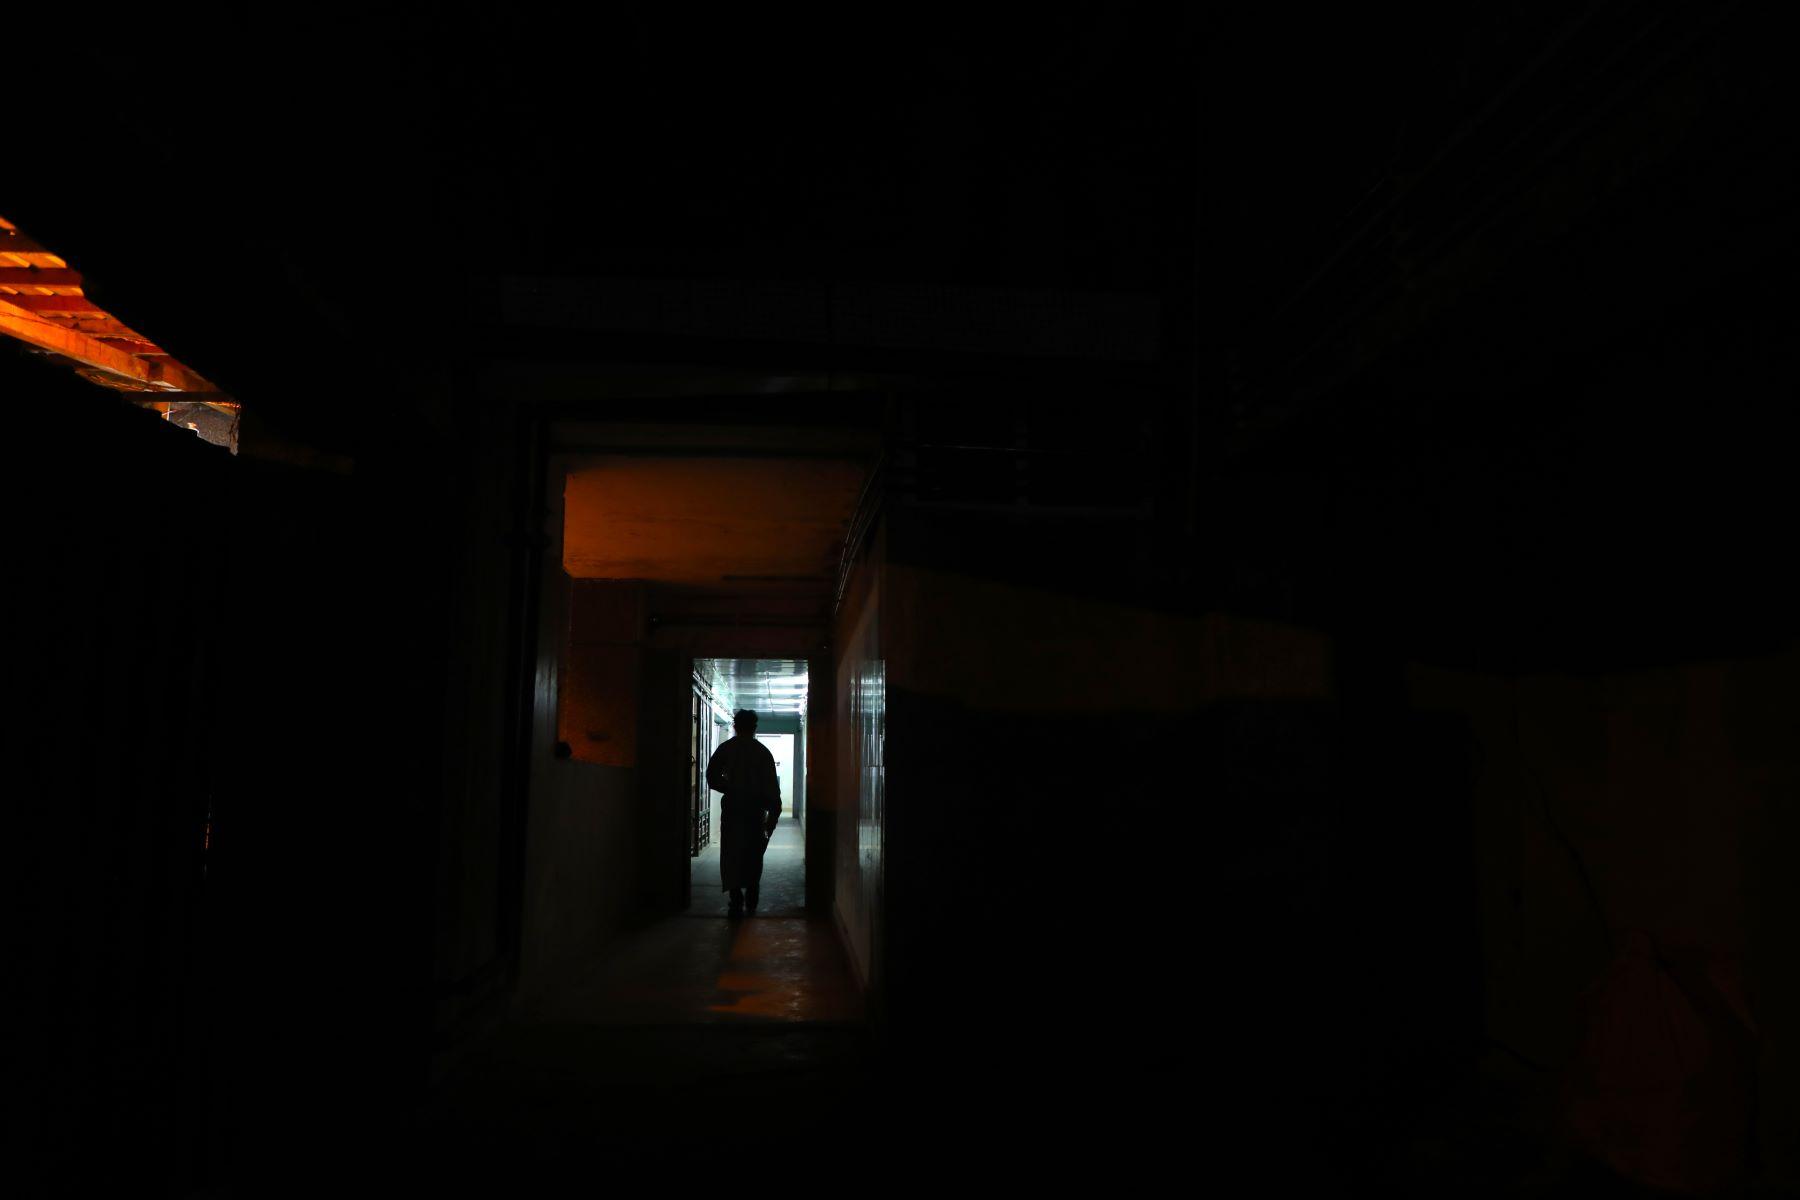 A Lone Walk To Meet The Dead